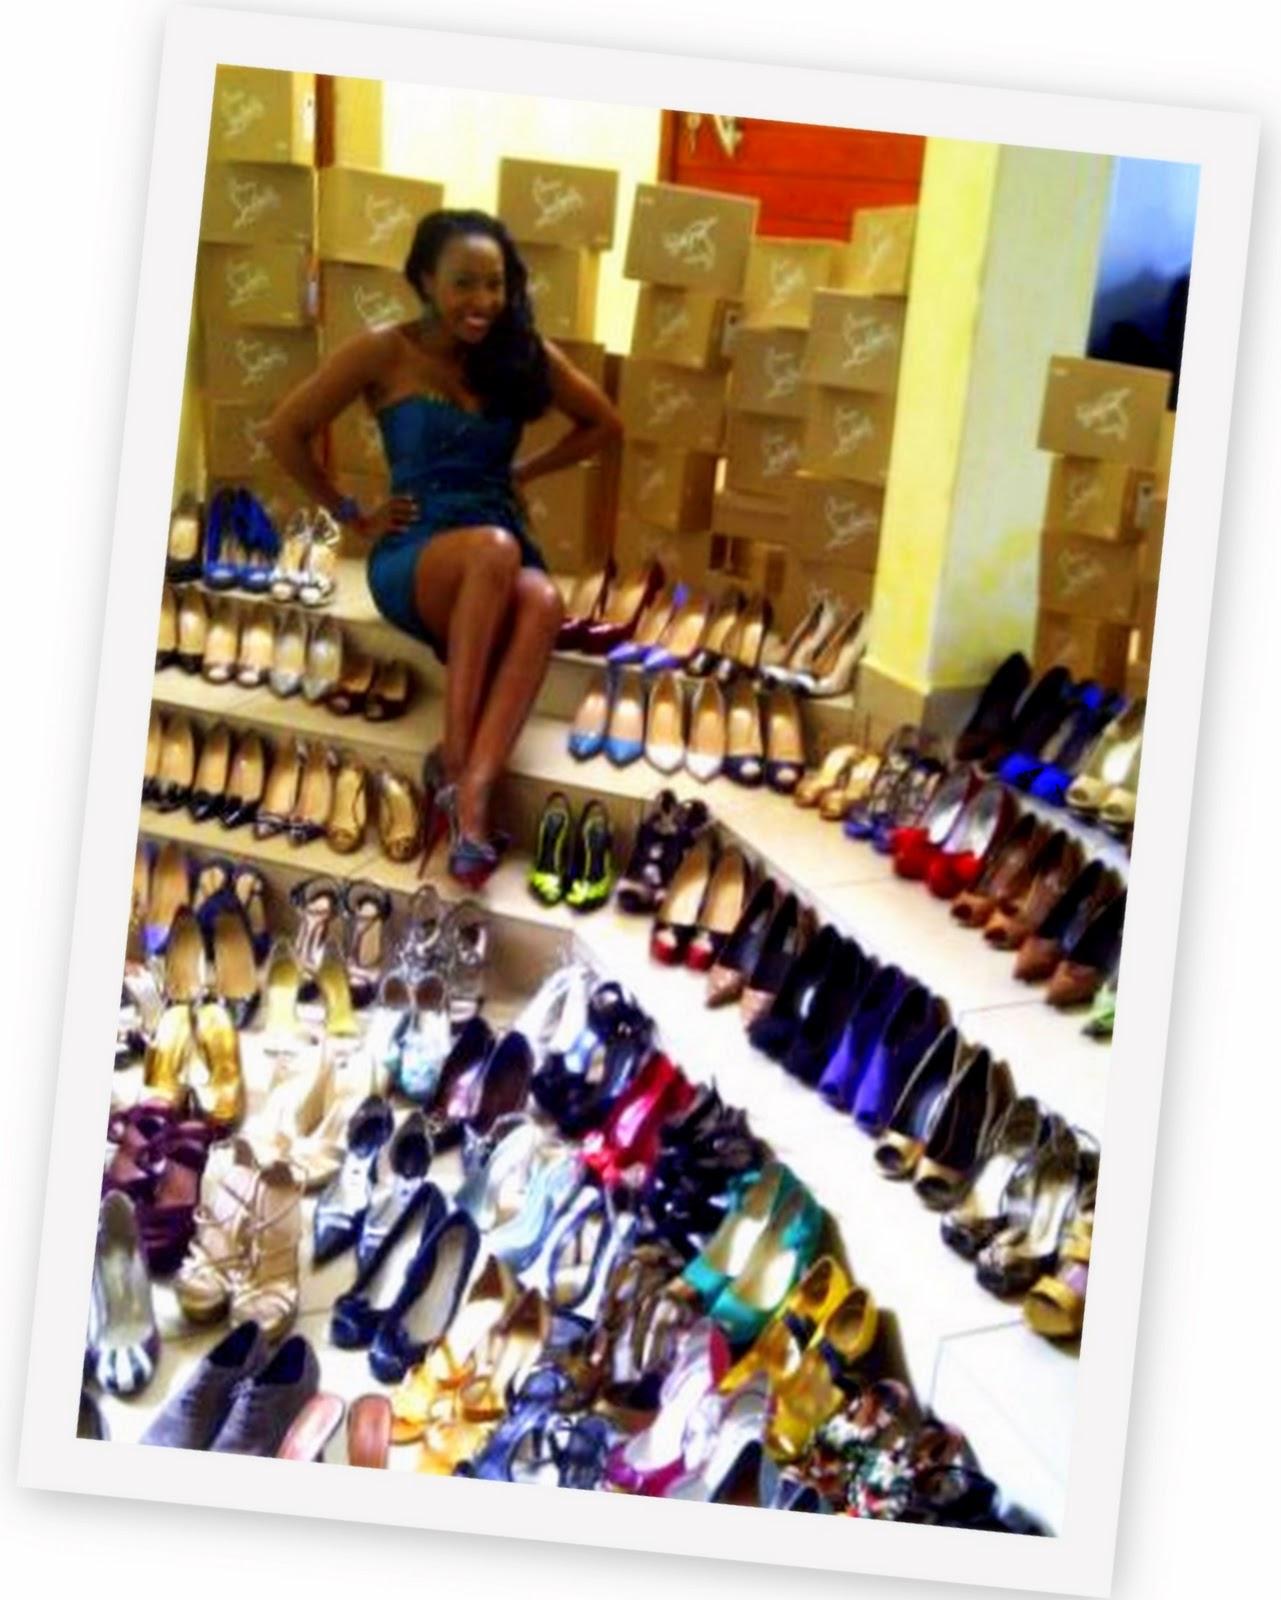 http://2.bp.blogspot.com/--kRzTFWuiho/TawhHQTHinI/AAAAAAAAAHU/3xIvD26rh78/s1600/Uyanda%2527s+shoe+collection.jpg